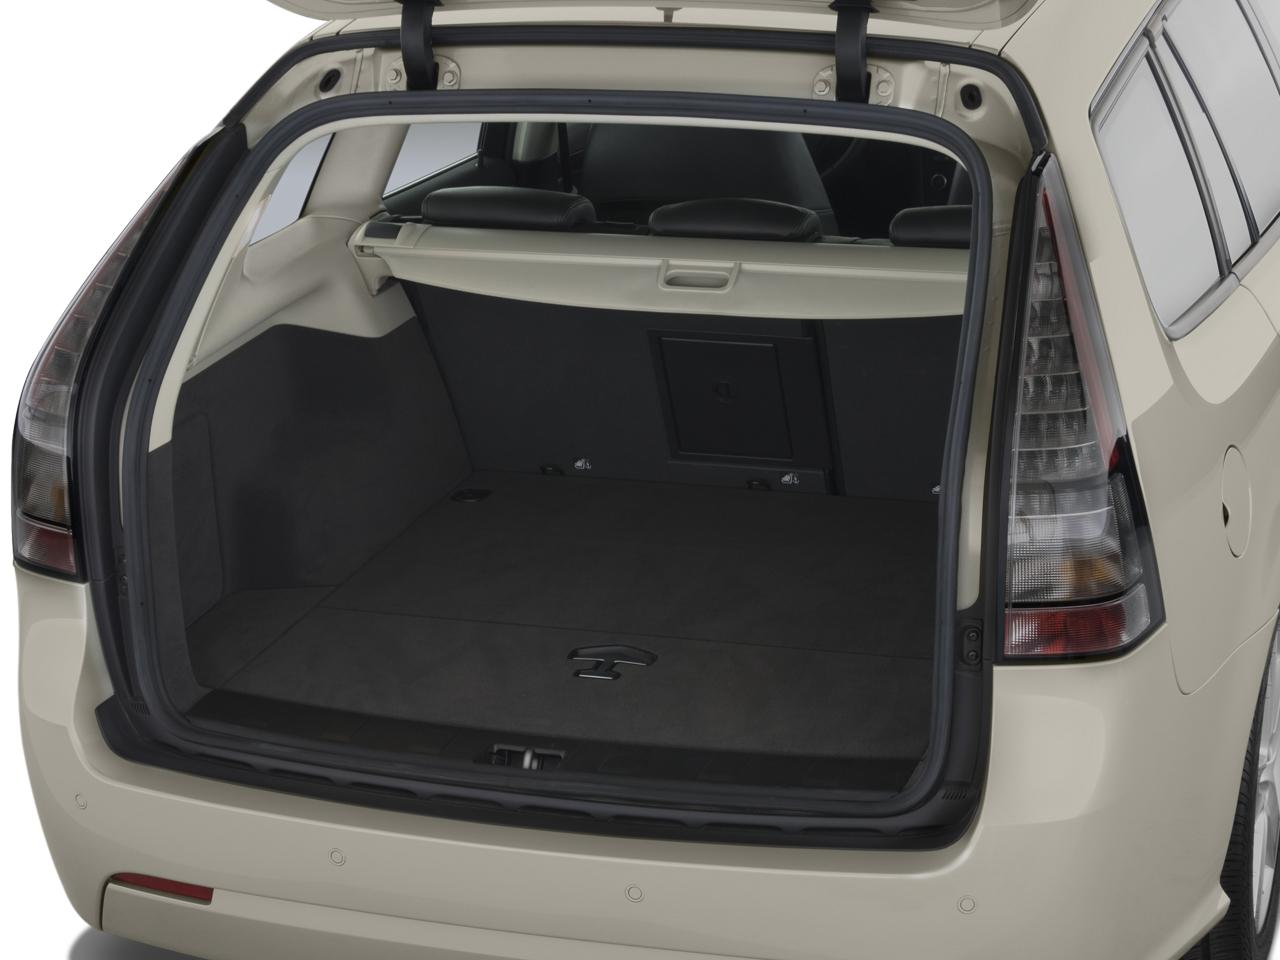 2008 Honda Civic Mpg >> 2008 Saab Turbo X SportCombi - Saab 9-3 Midsize Wagon ...